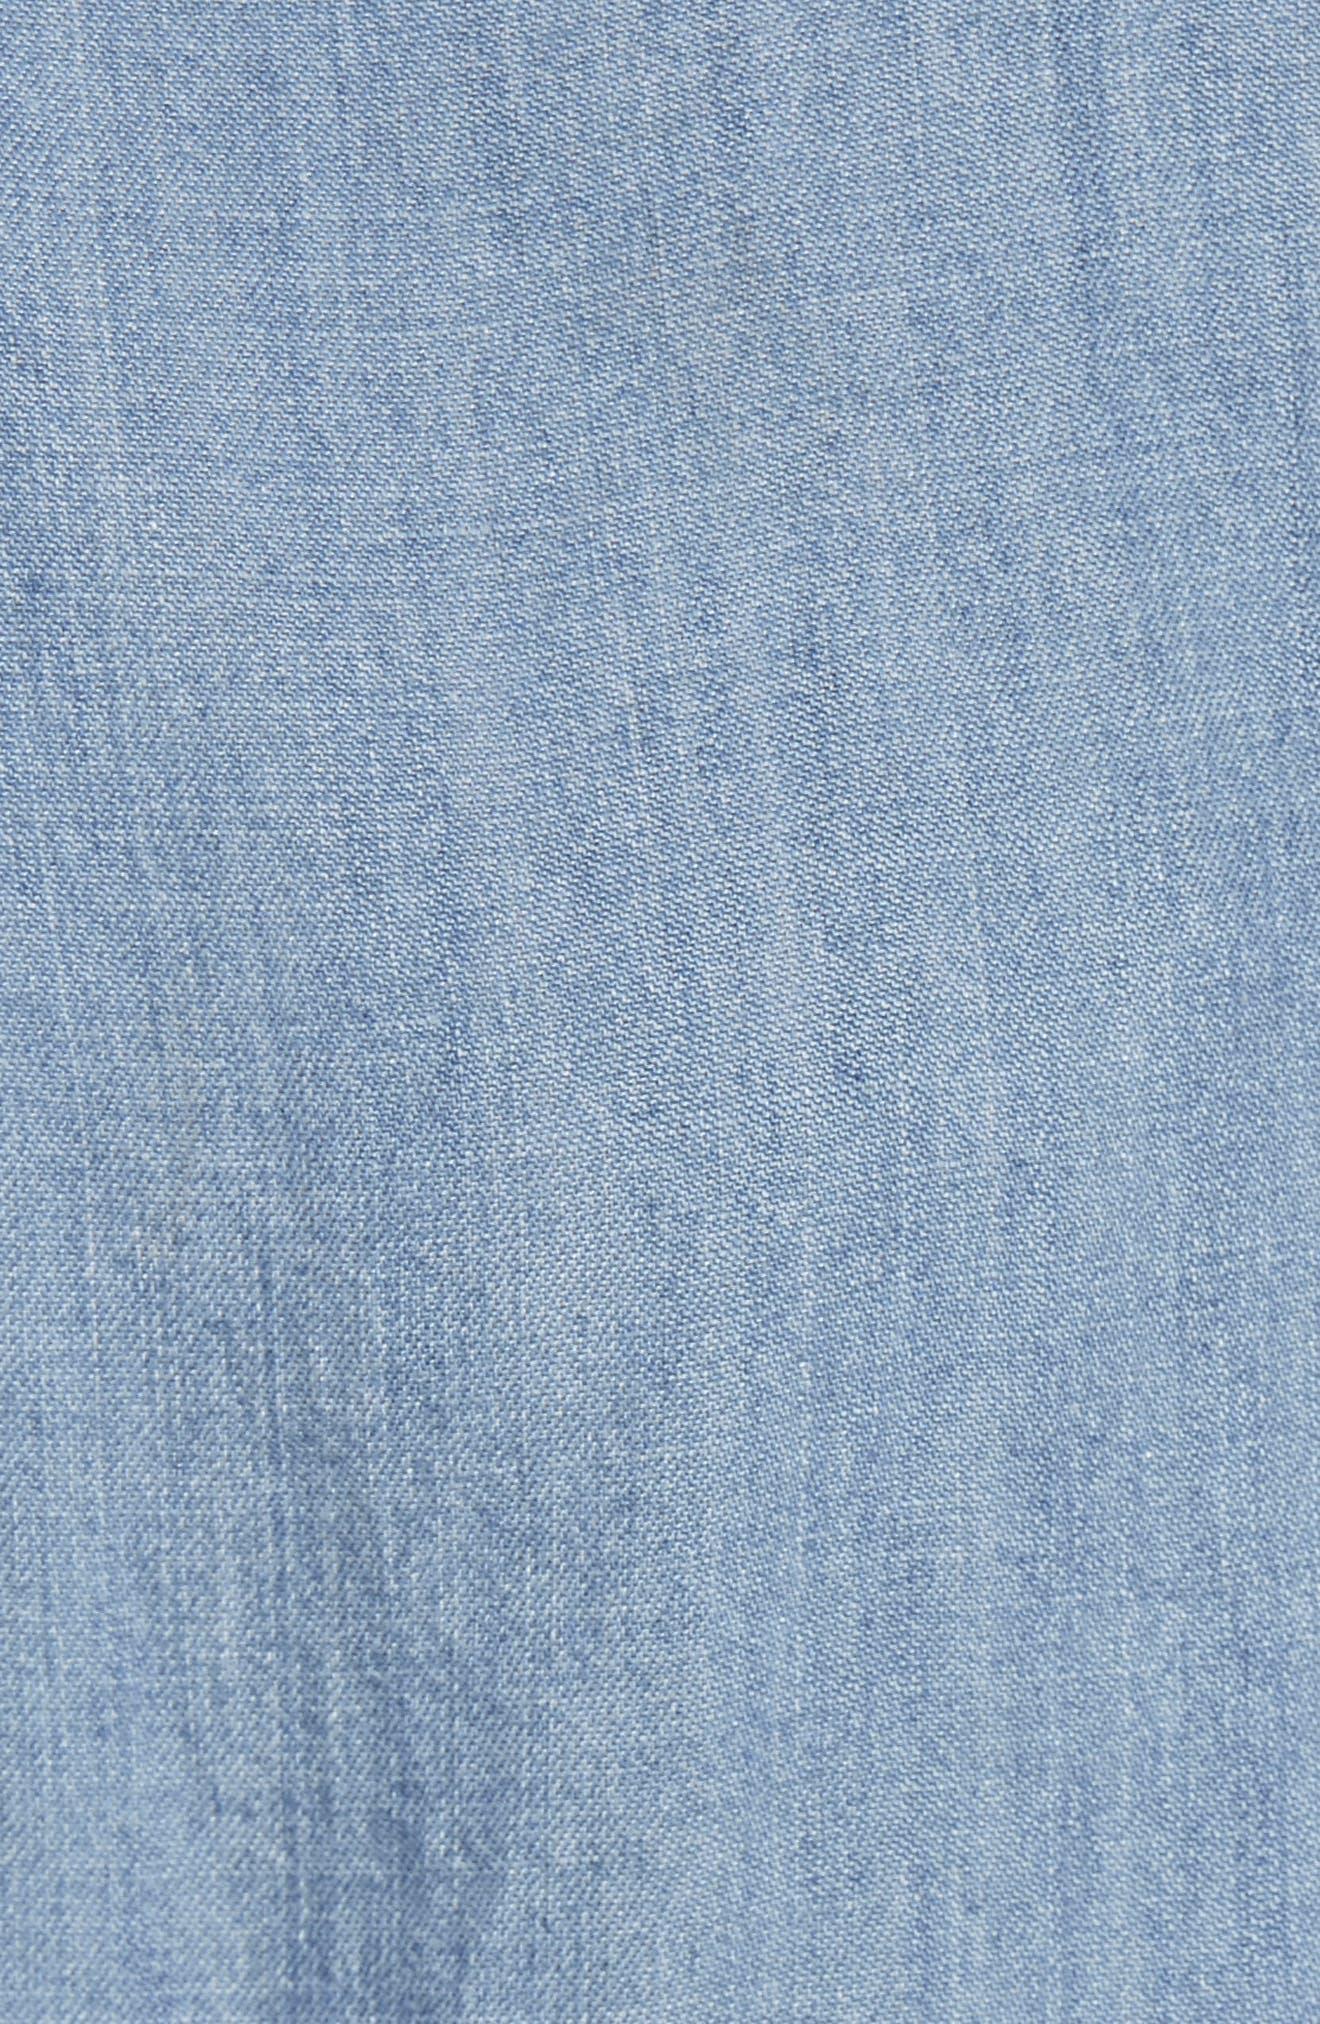 Ingrid Studded Shirt,                             Alternate thumbnail 5, color,                             493